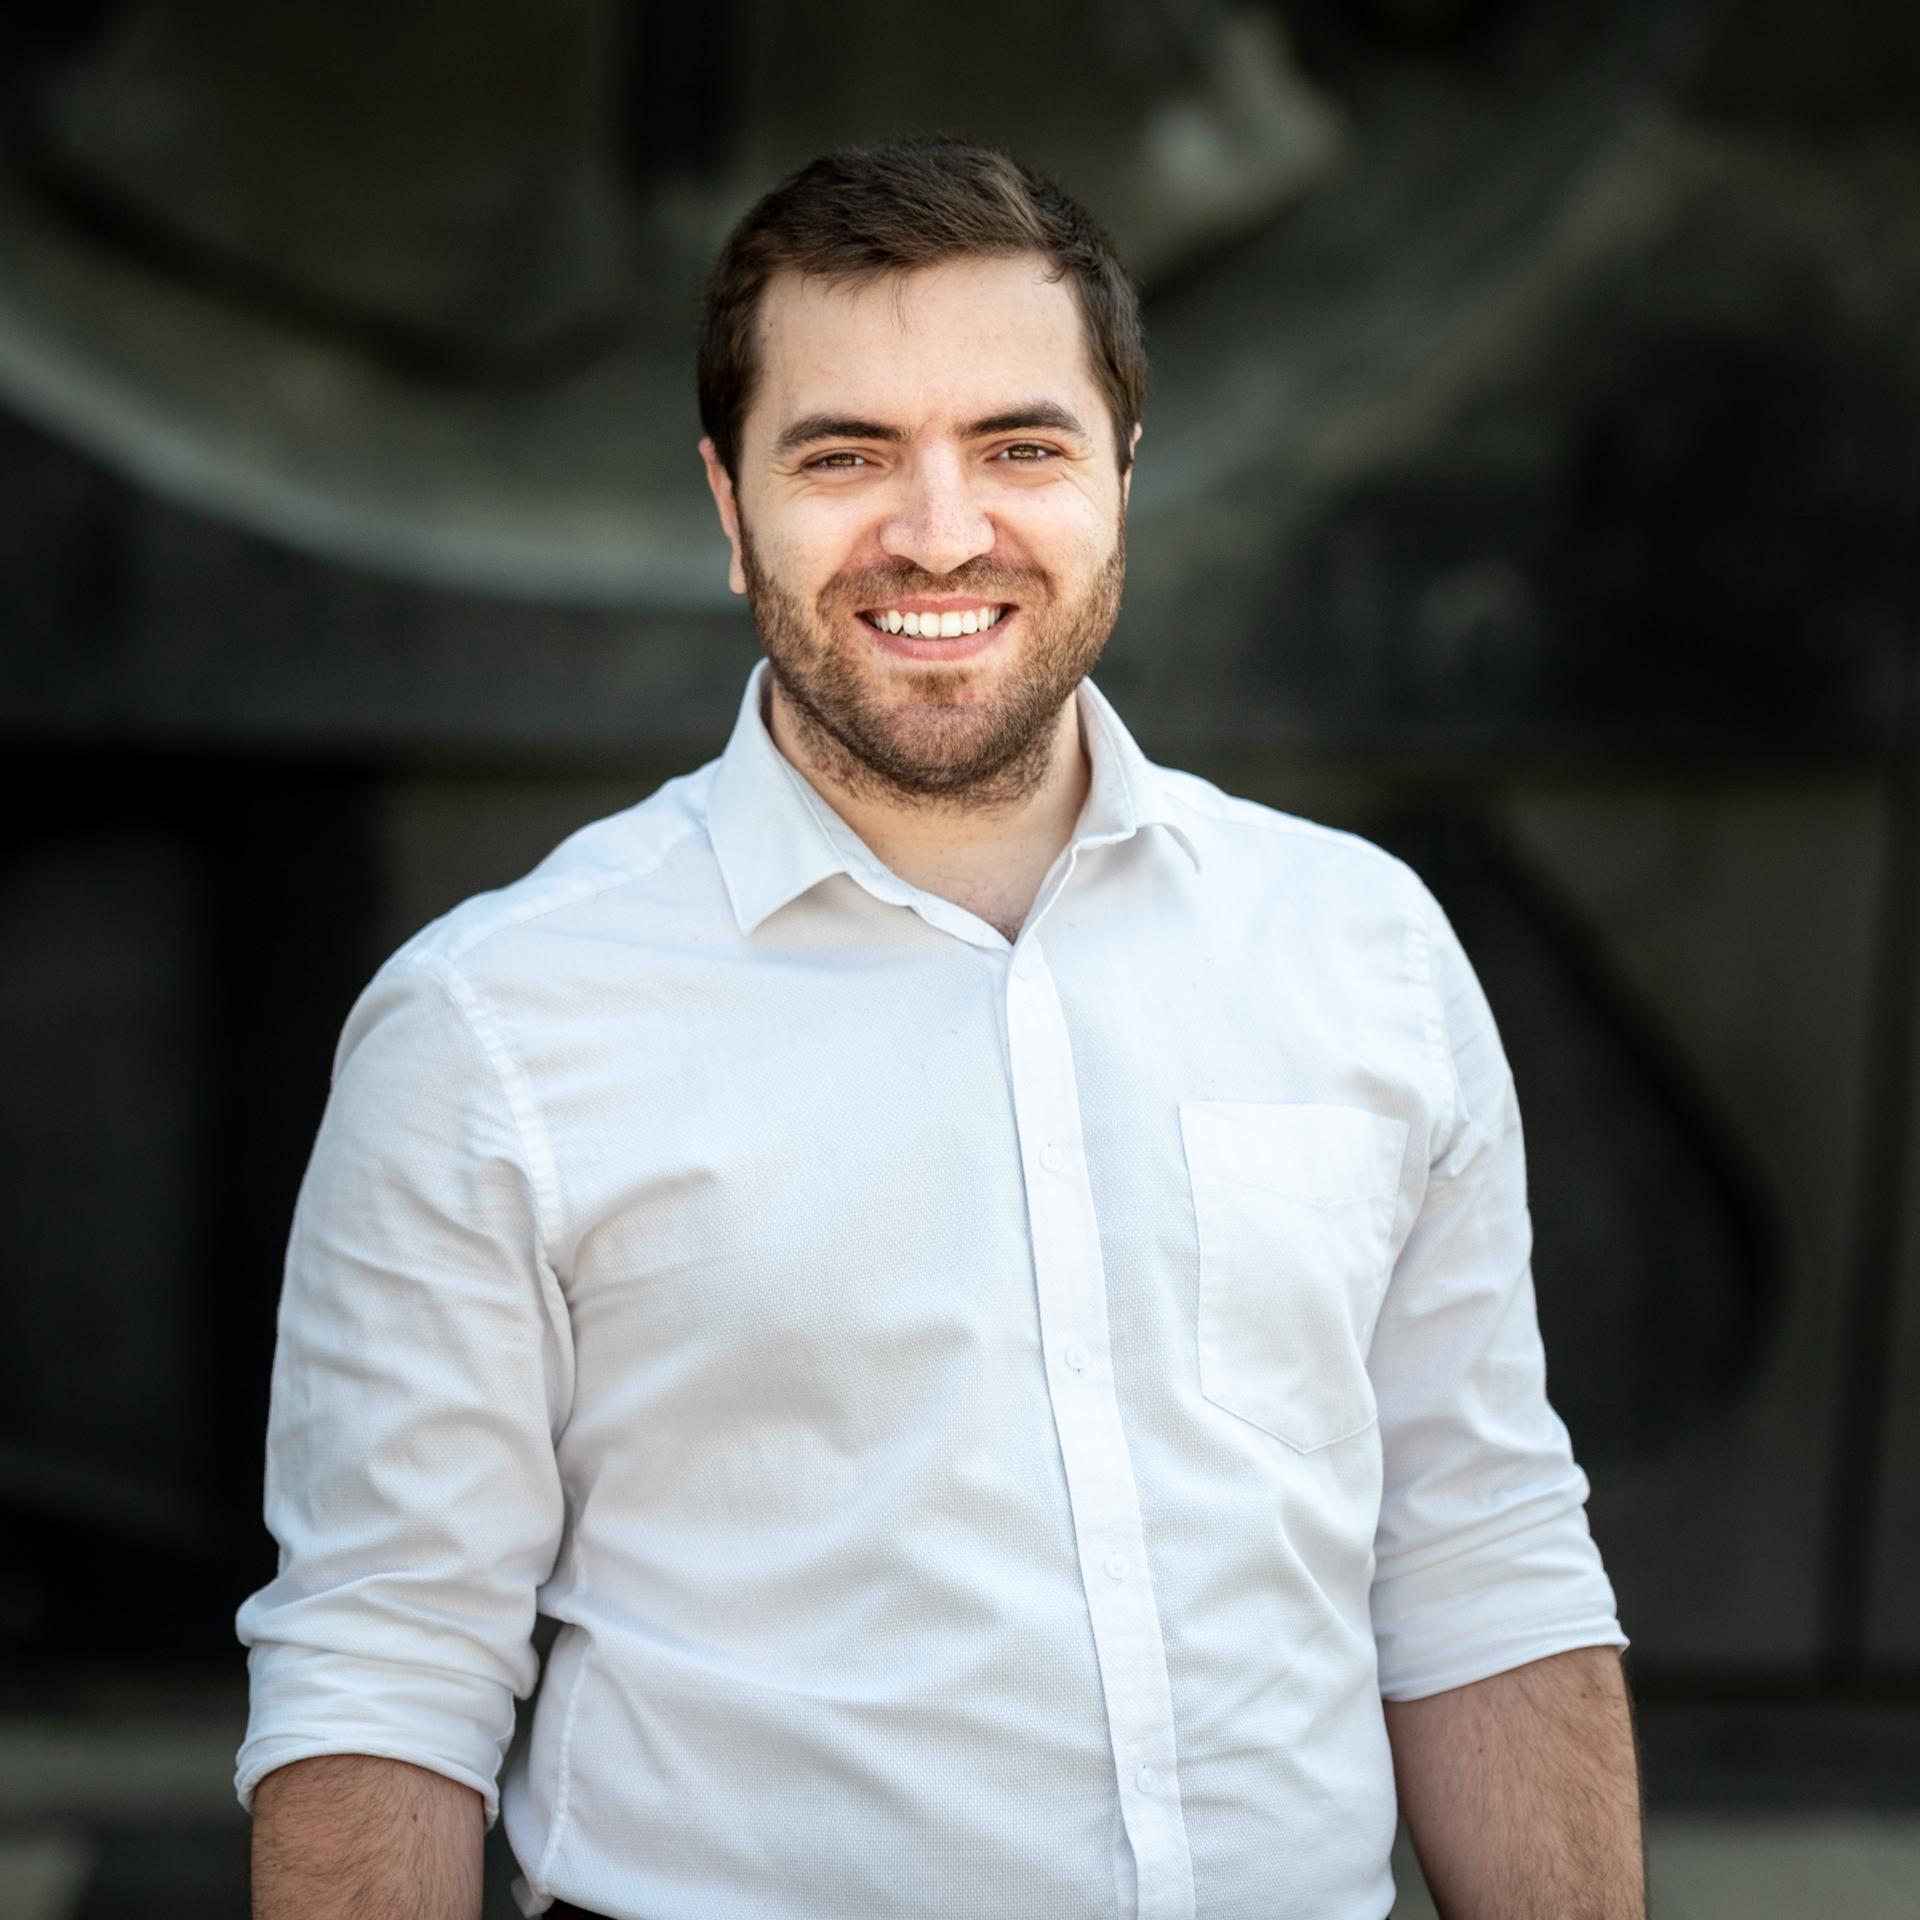 Daniel BRAIKEH zakladateľ projektu Rodinoviny